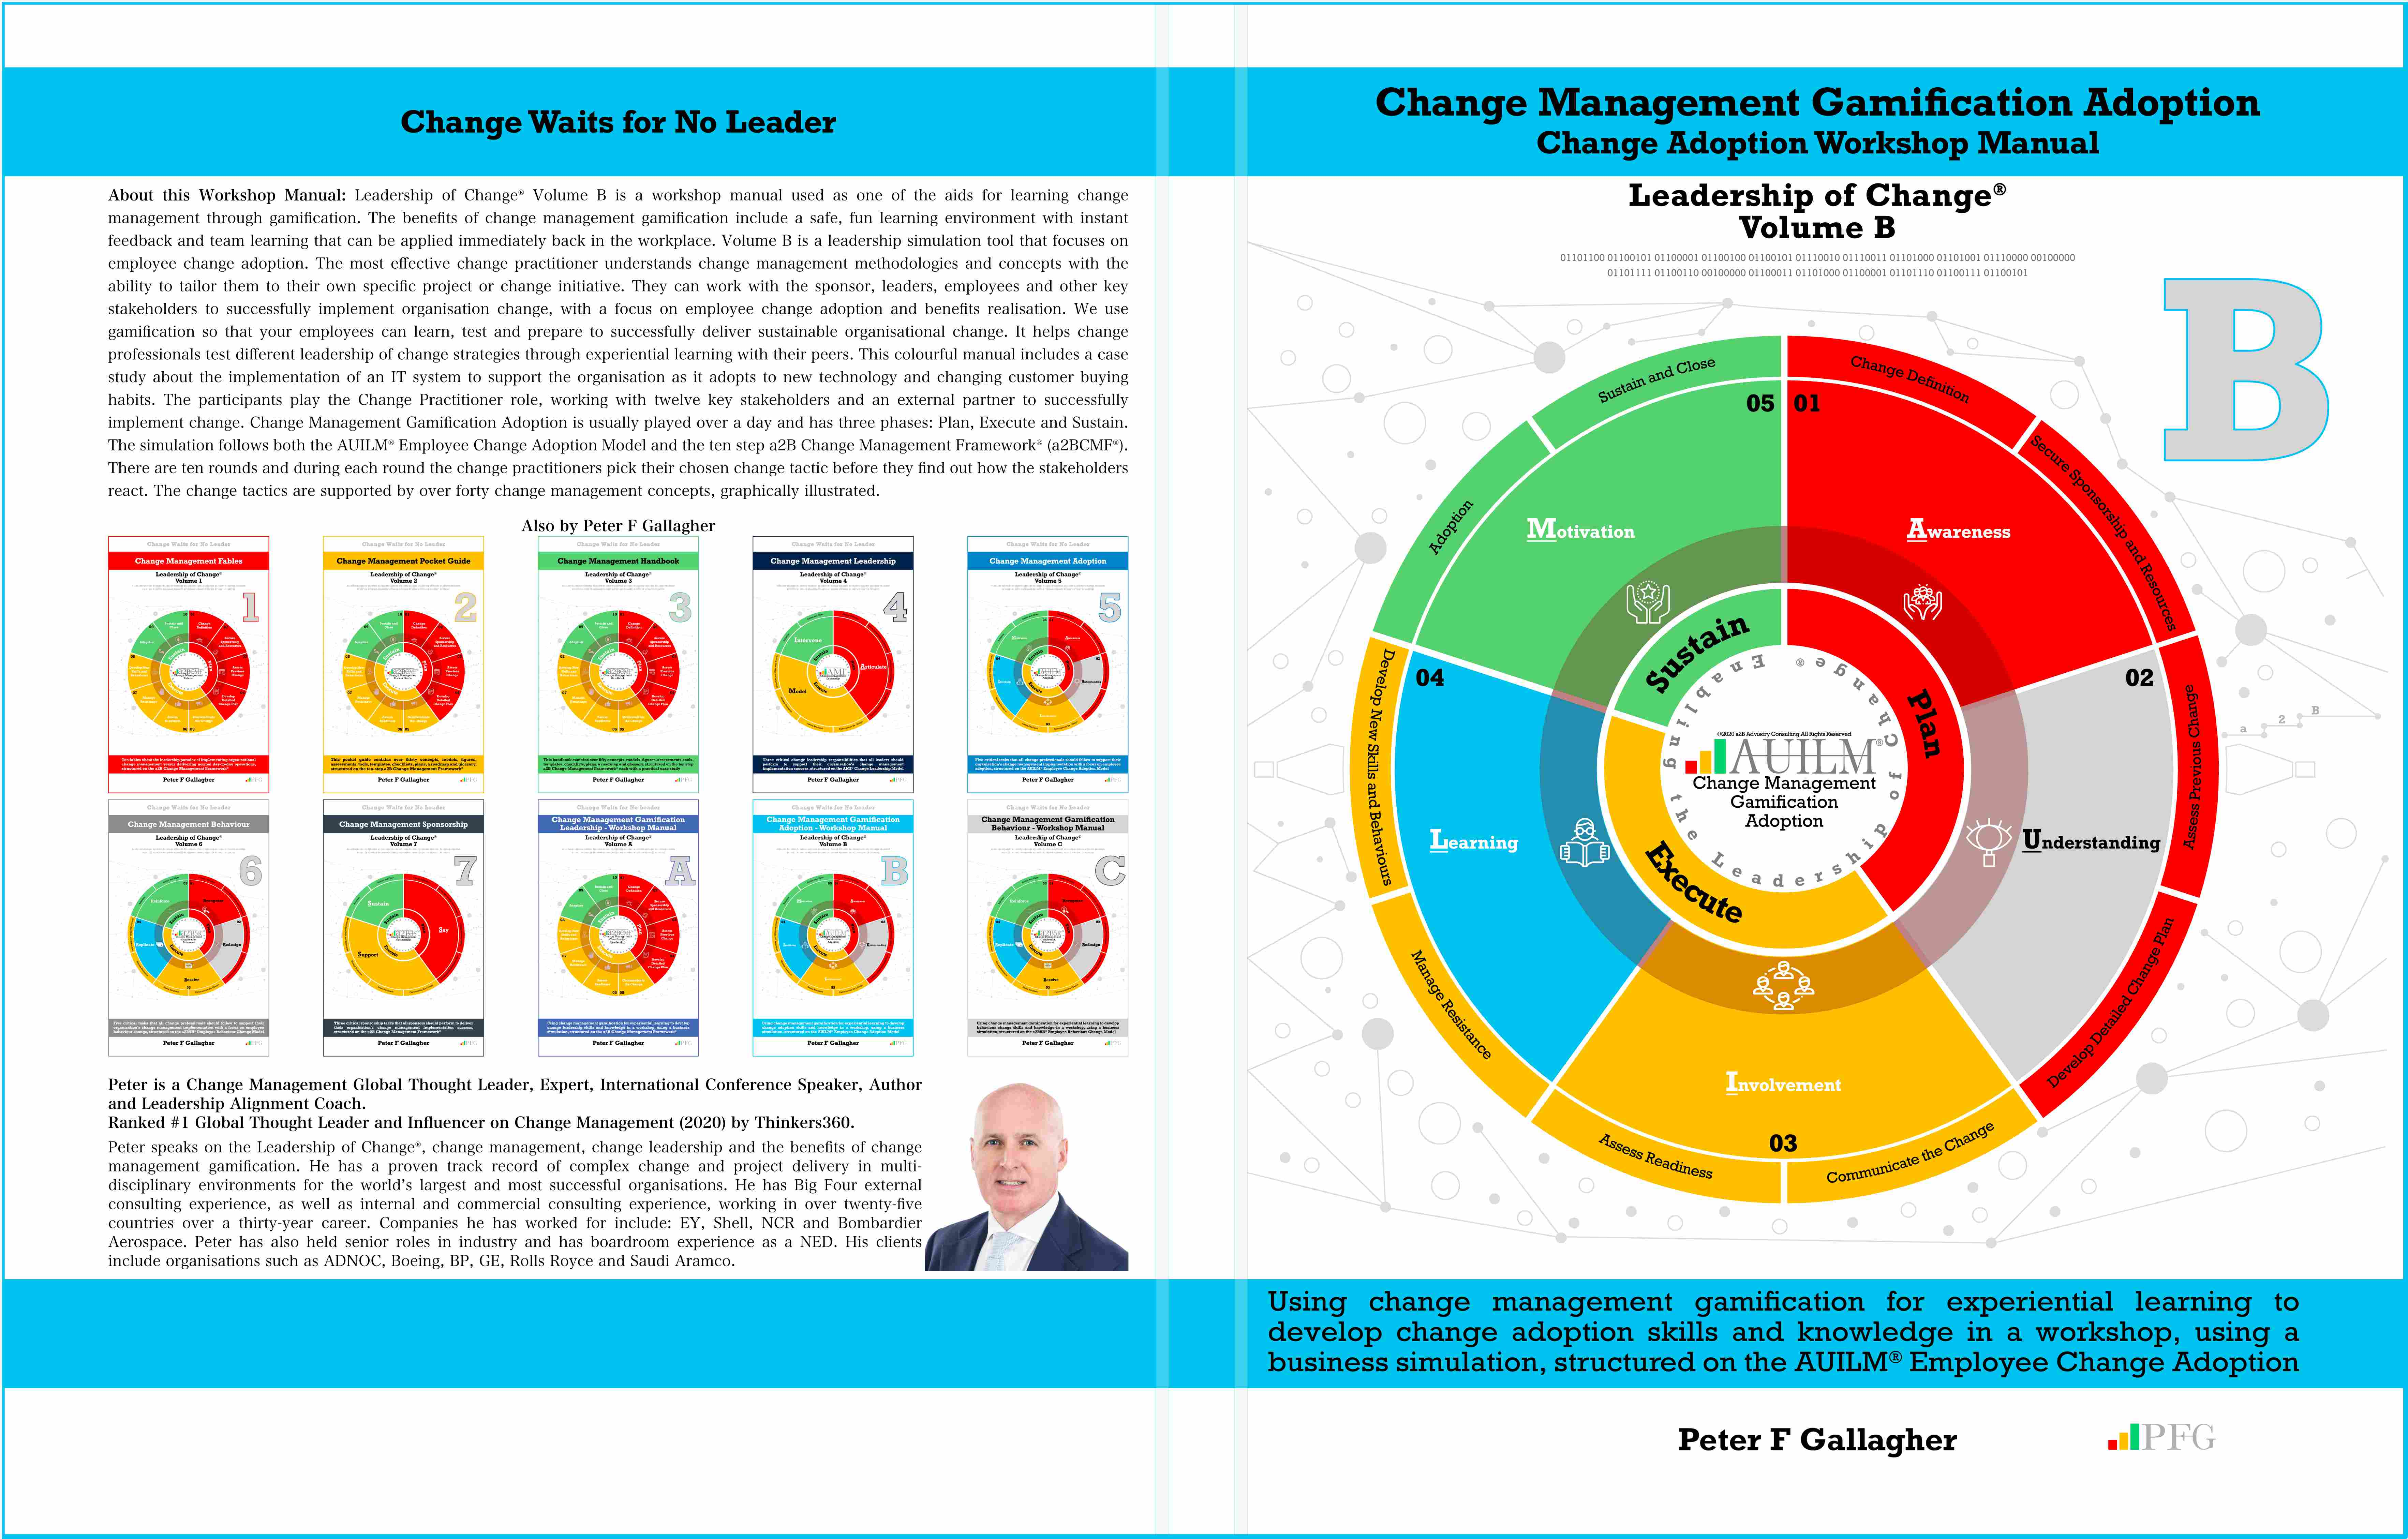 Change Management Gamification Adoption, Change Management Book, Change Management Books, Change Man